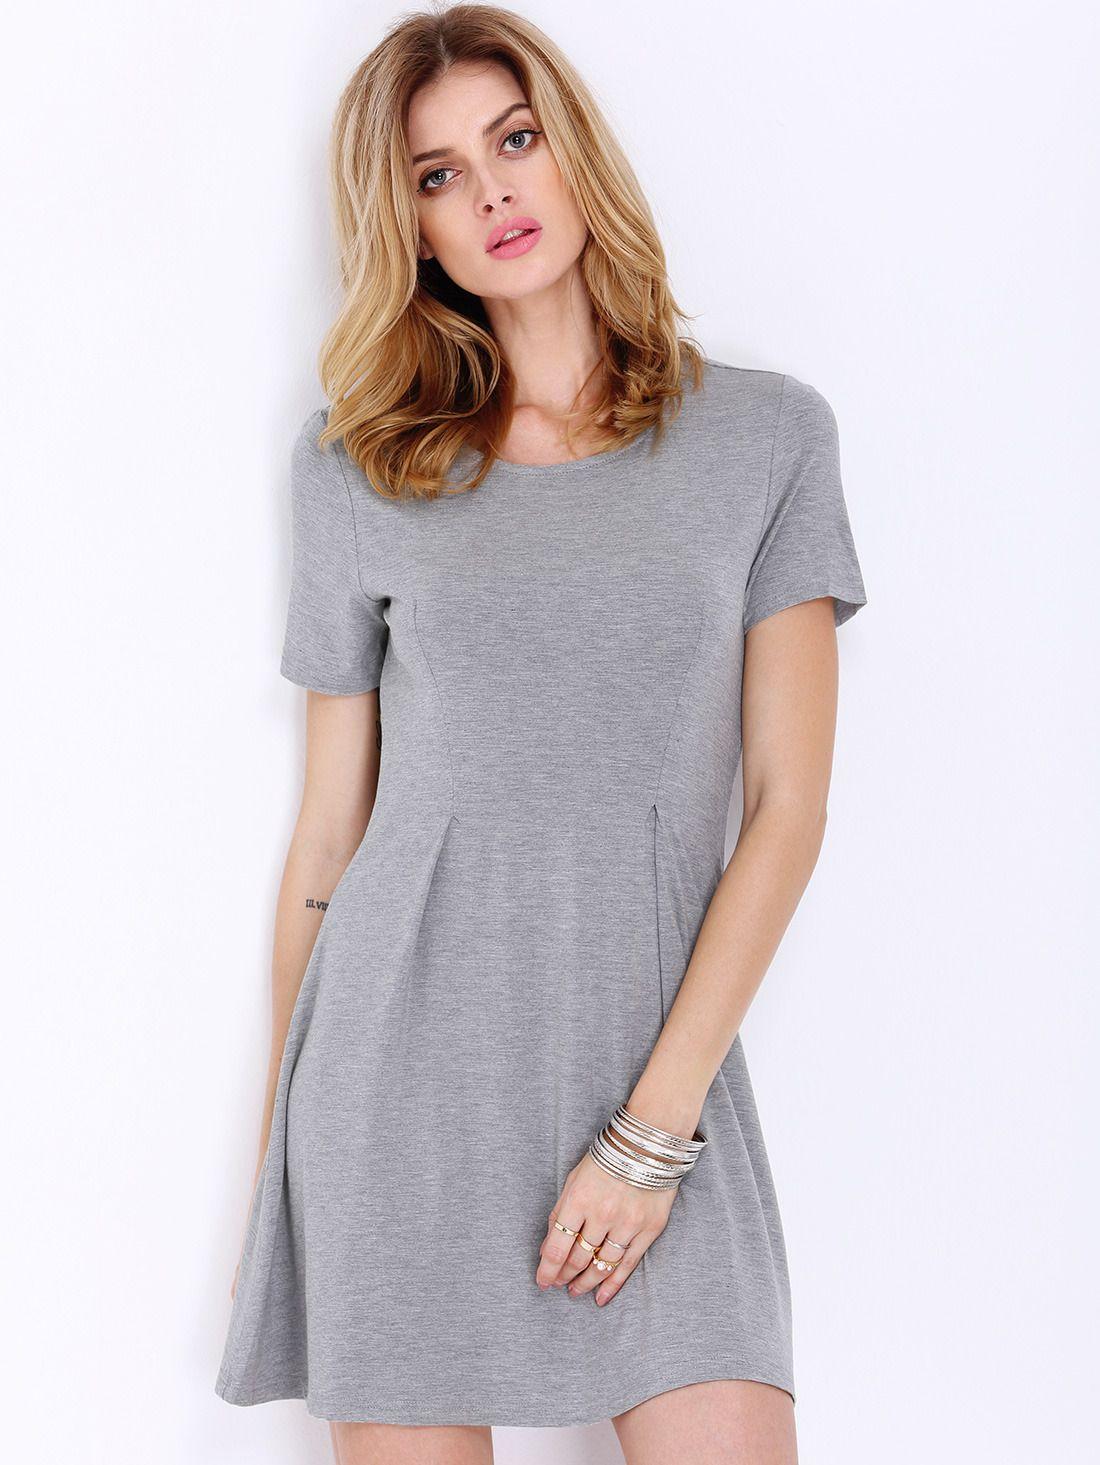 Grey Short Sleeve Casual Dress Casual Dress Short Shift Dress Short Sleeve Shift Dress [ 1465 x 1100 Pixel ]